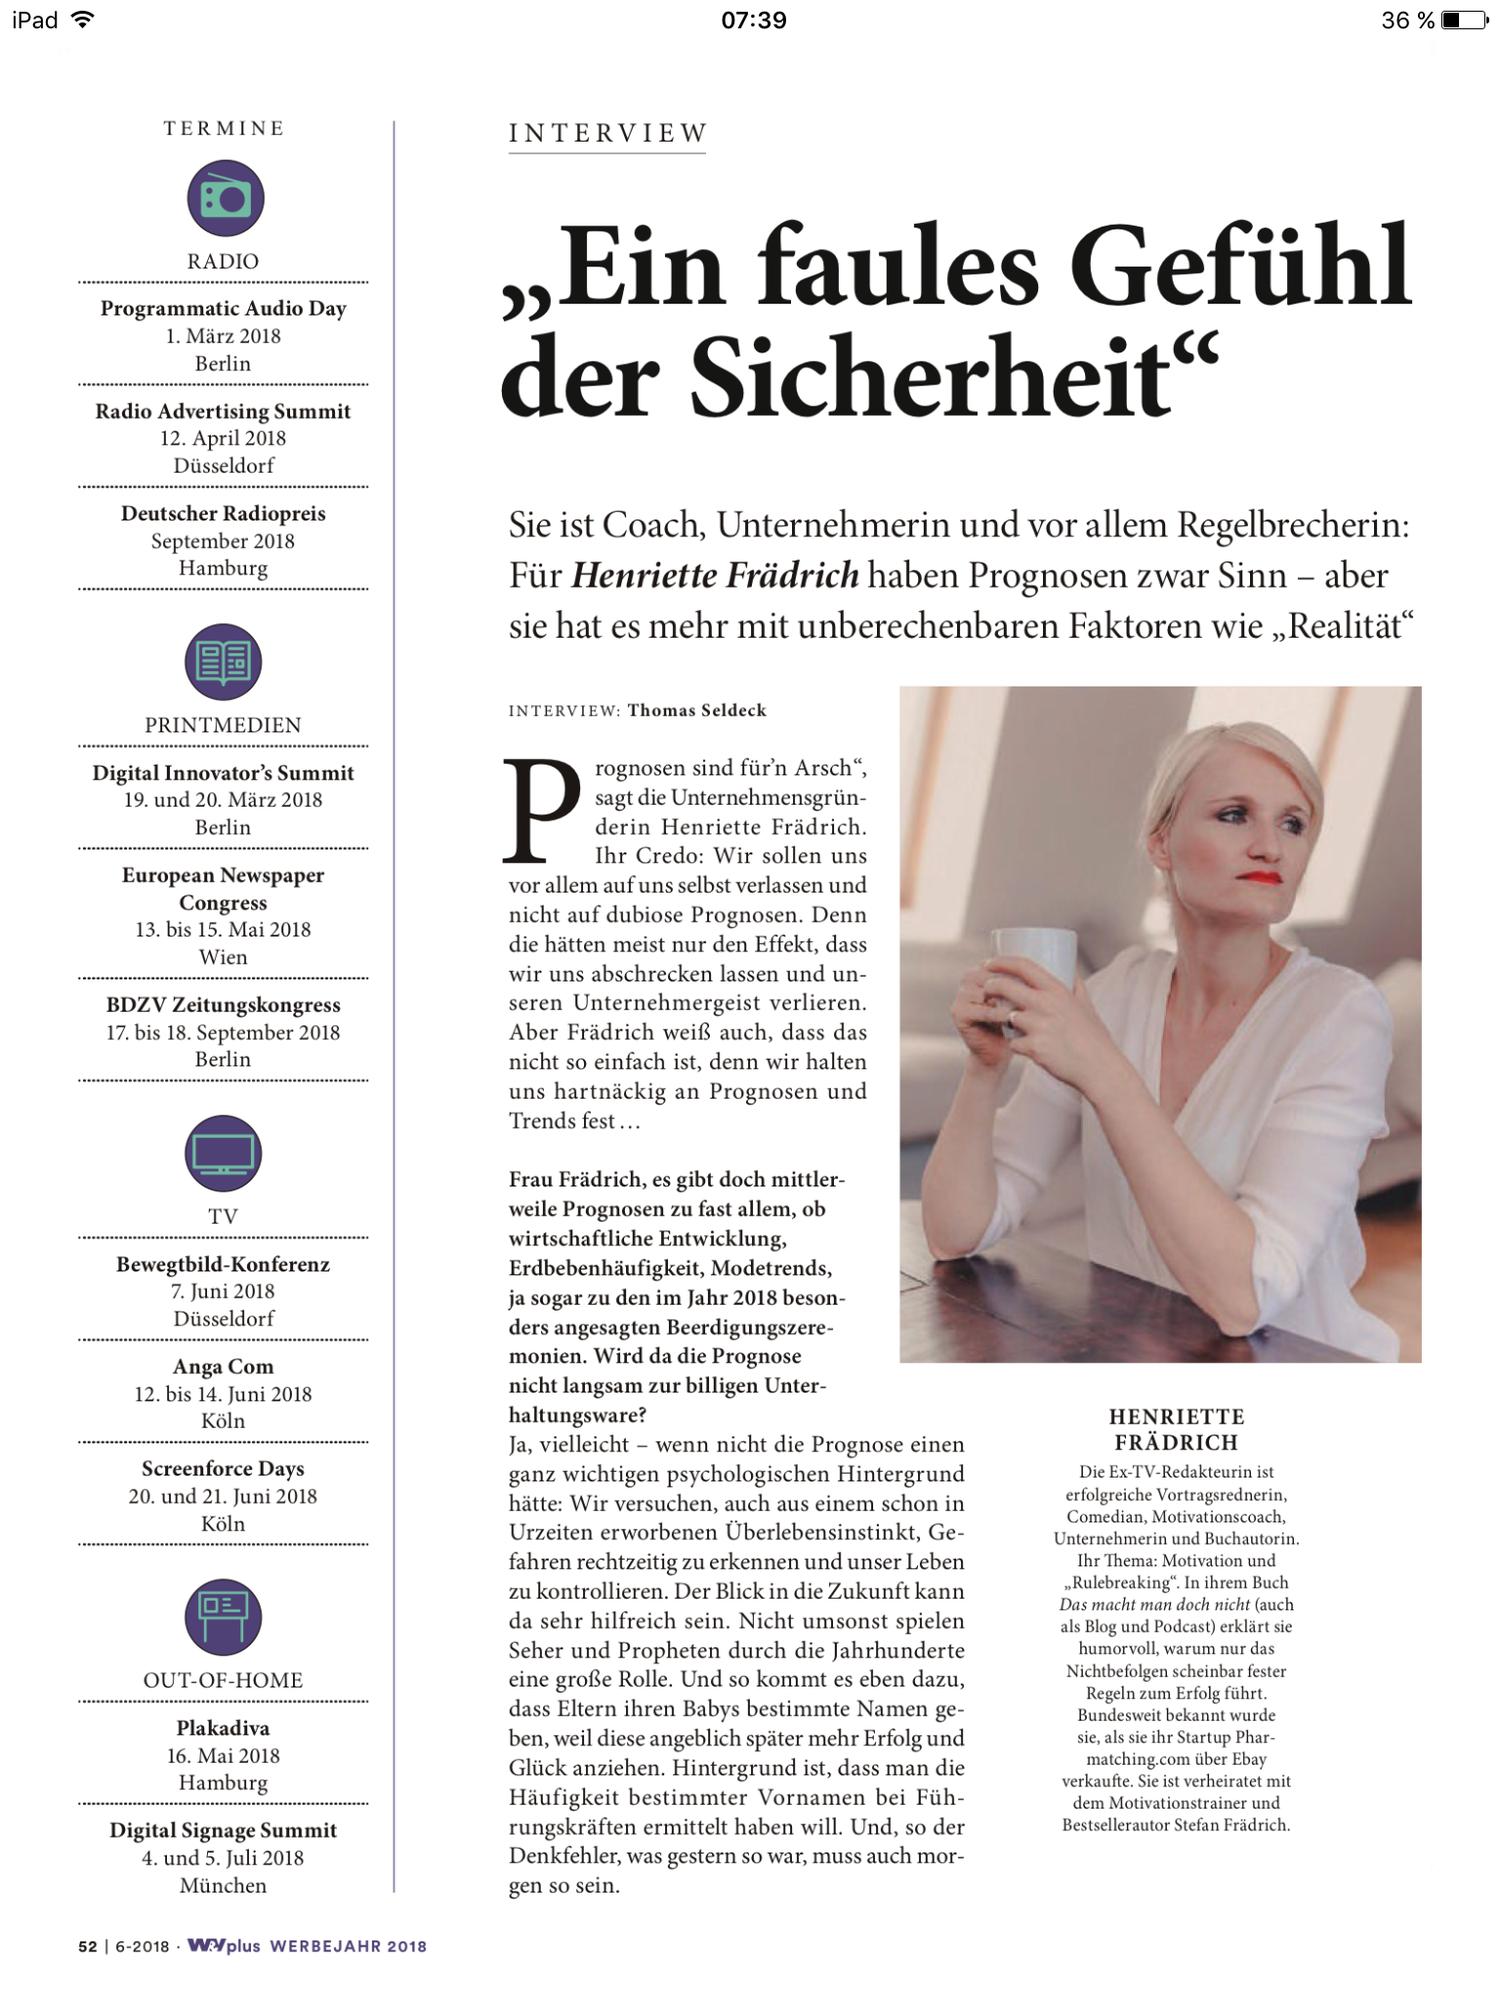 Henriette+Frädrich+Interview+W&V.png